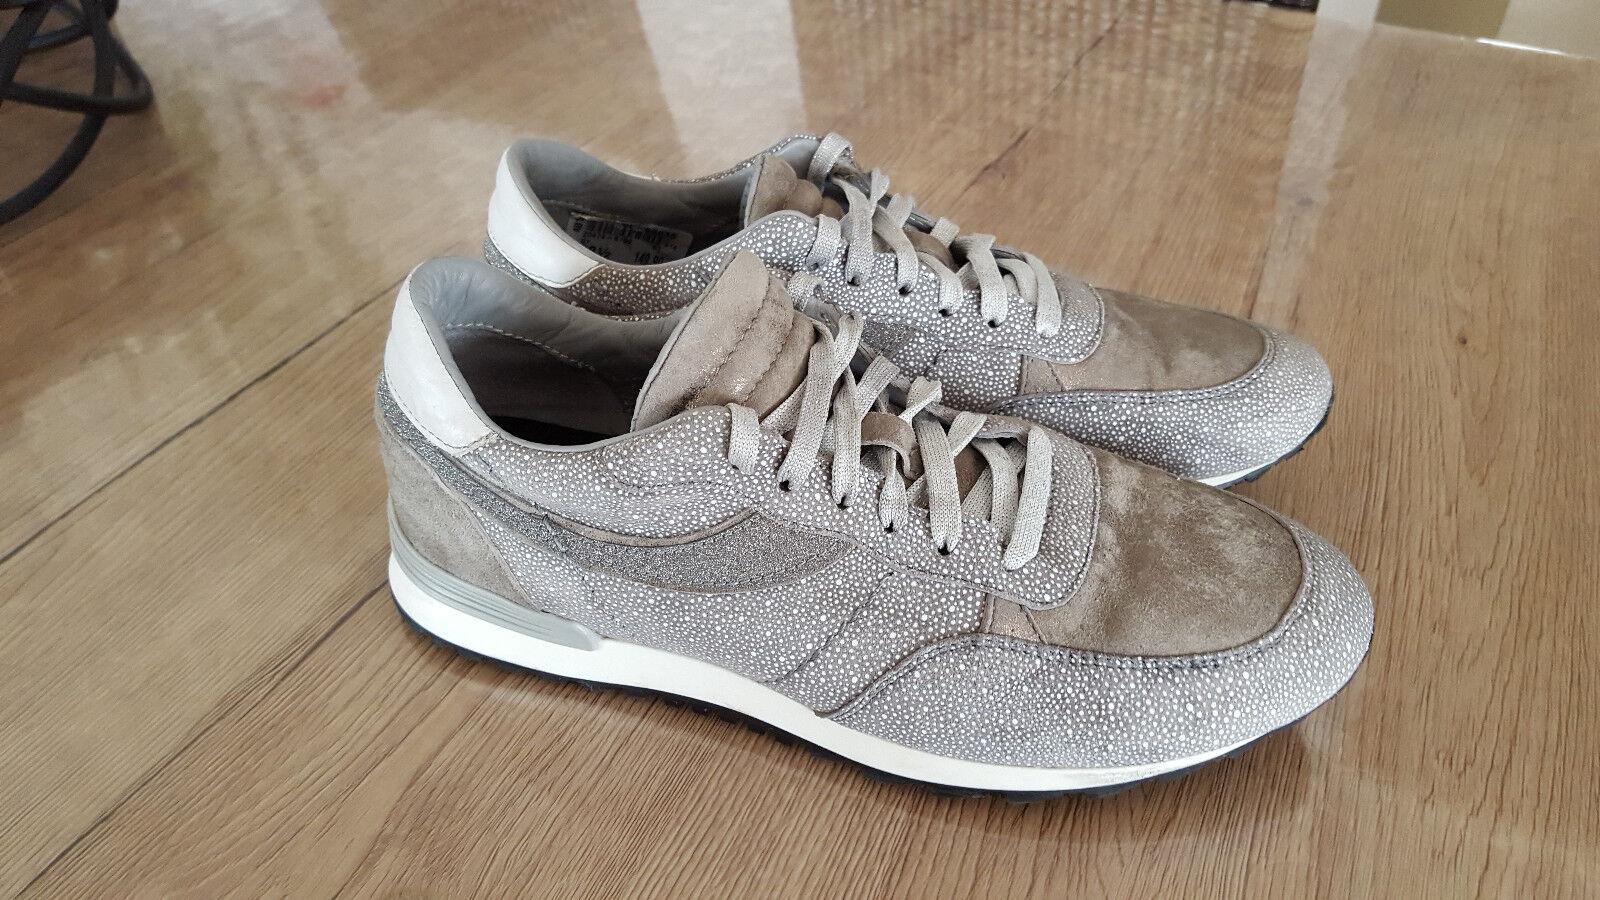 Gommus Damenschuhe Schuhe Sneaker 38,5  Gr. 38,5 Sneaker Grau/Taupe TOP d4c26c